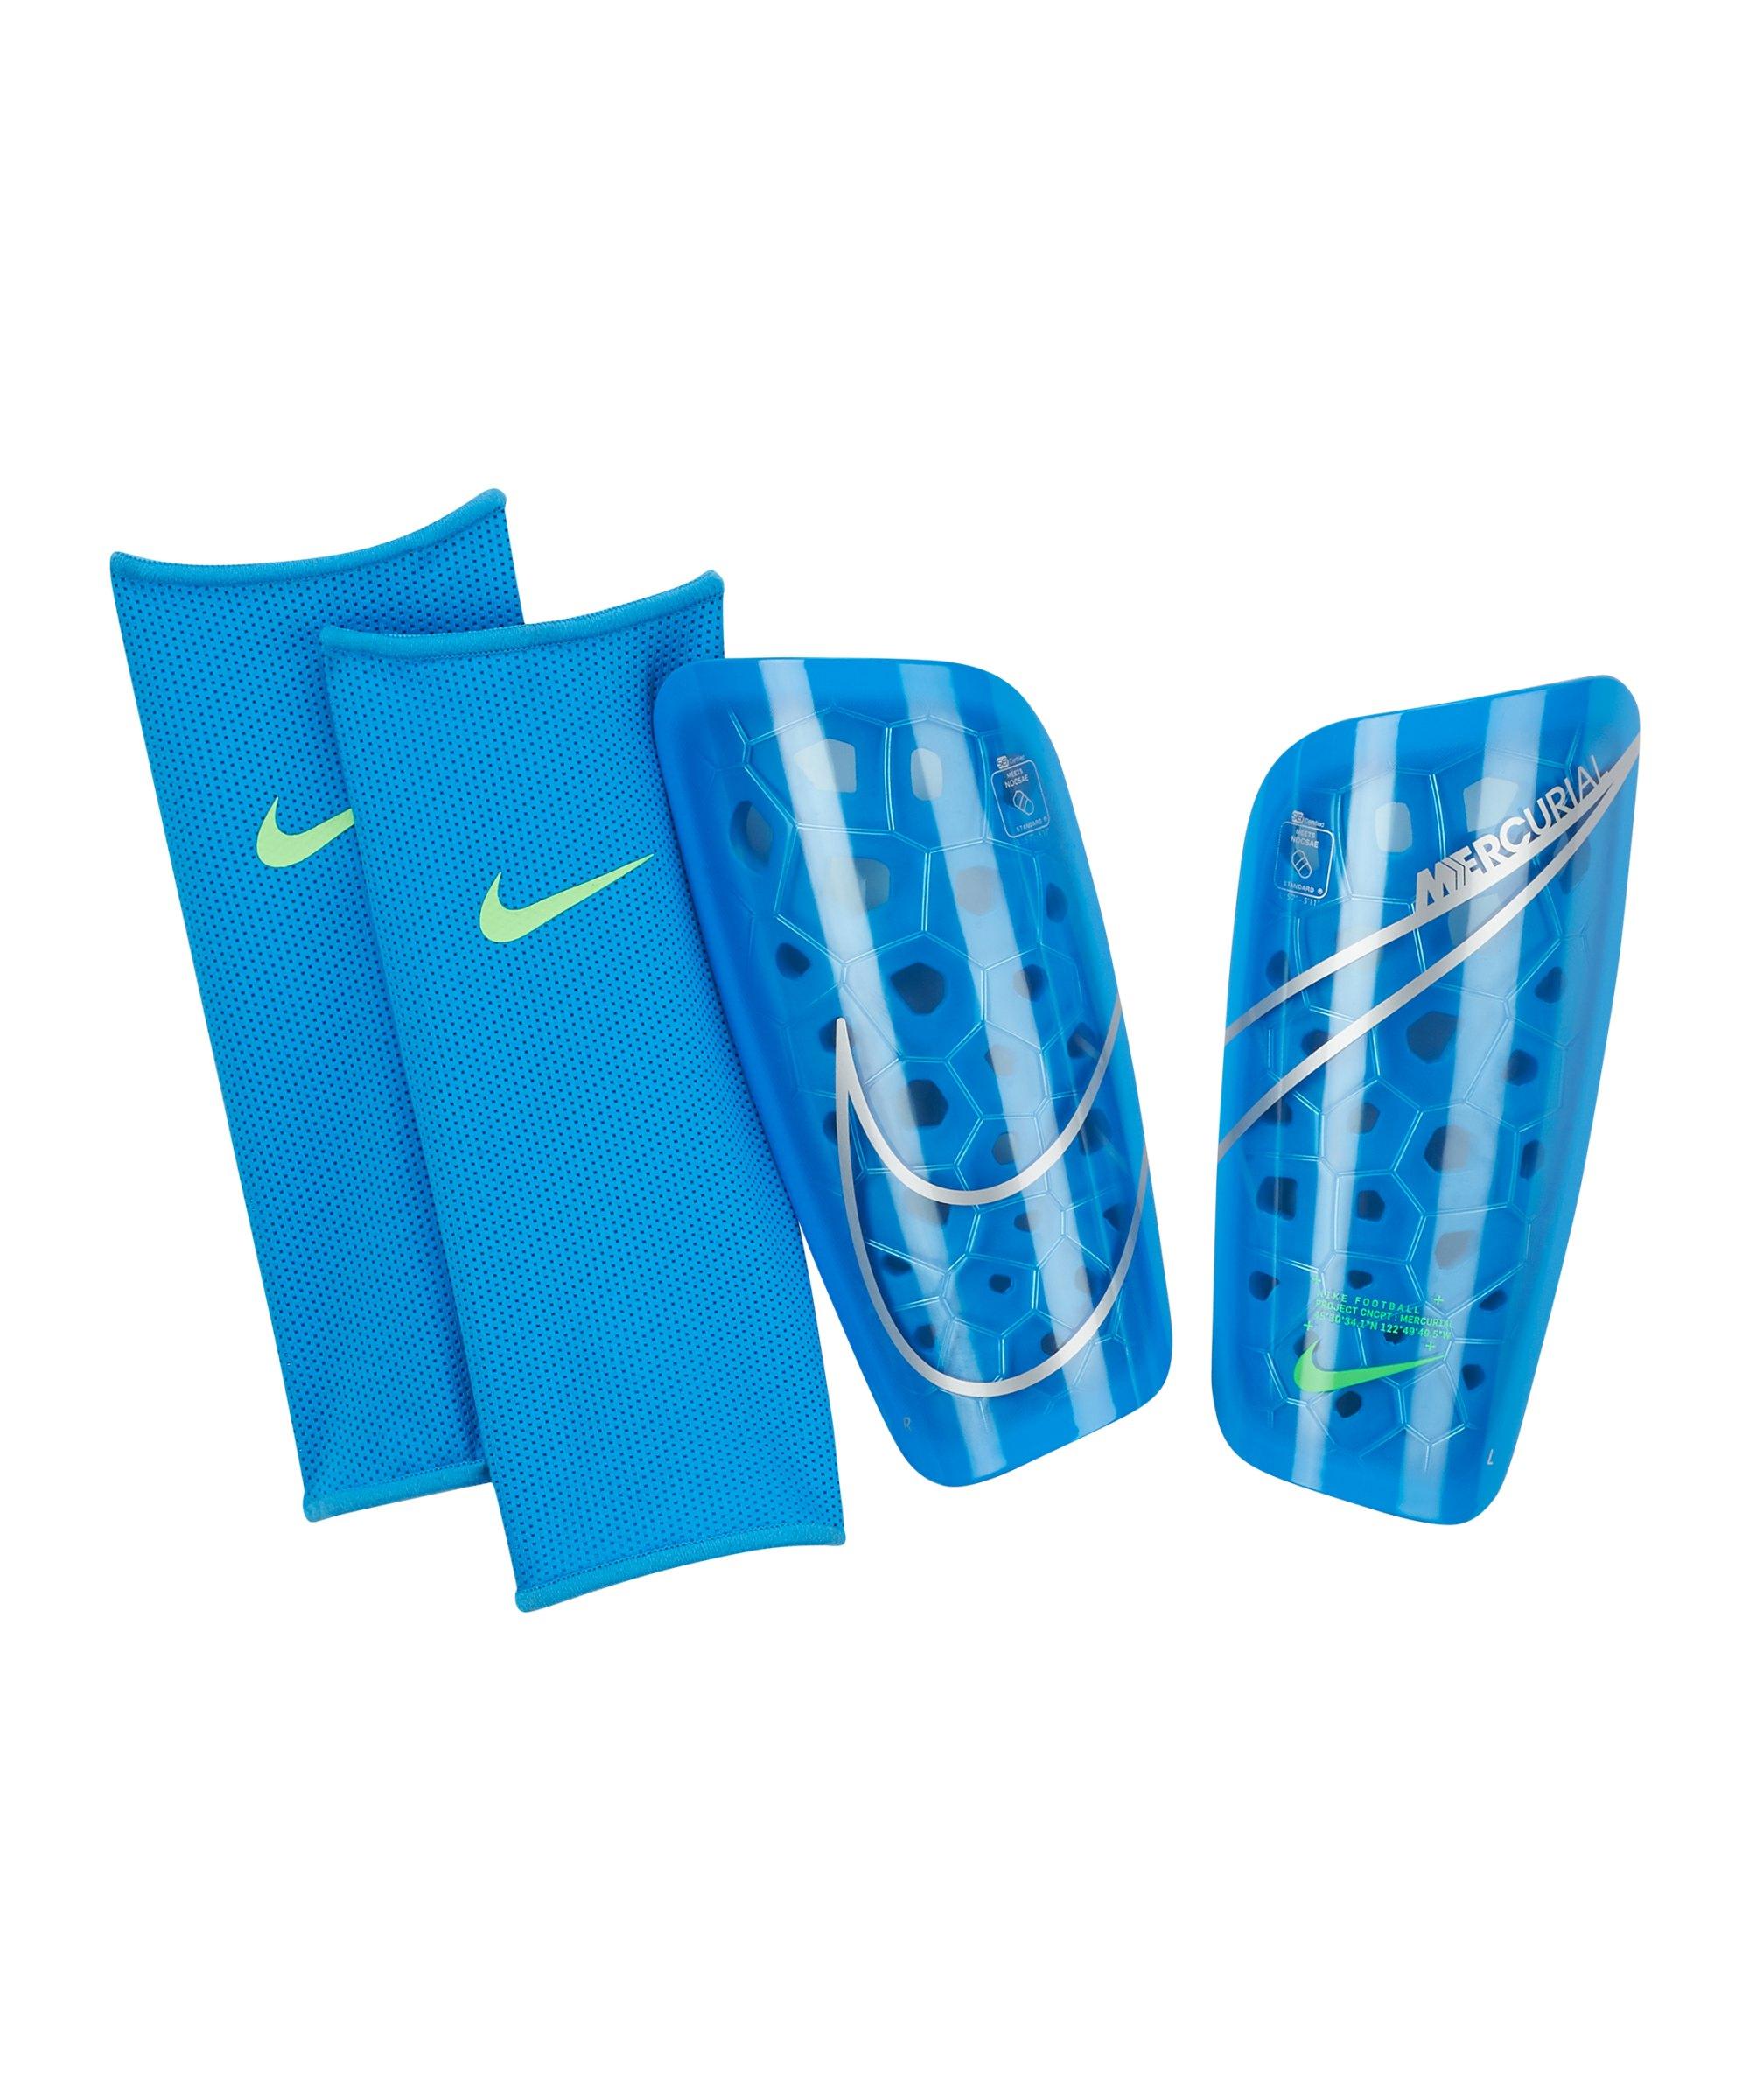 Nike Mercurial Lite Schienbeinschoner Blau F406 - blau